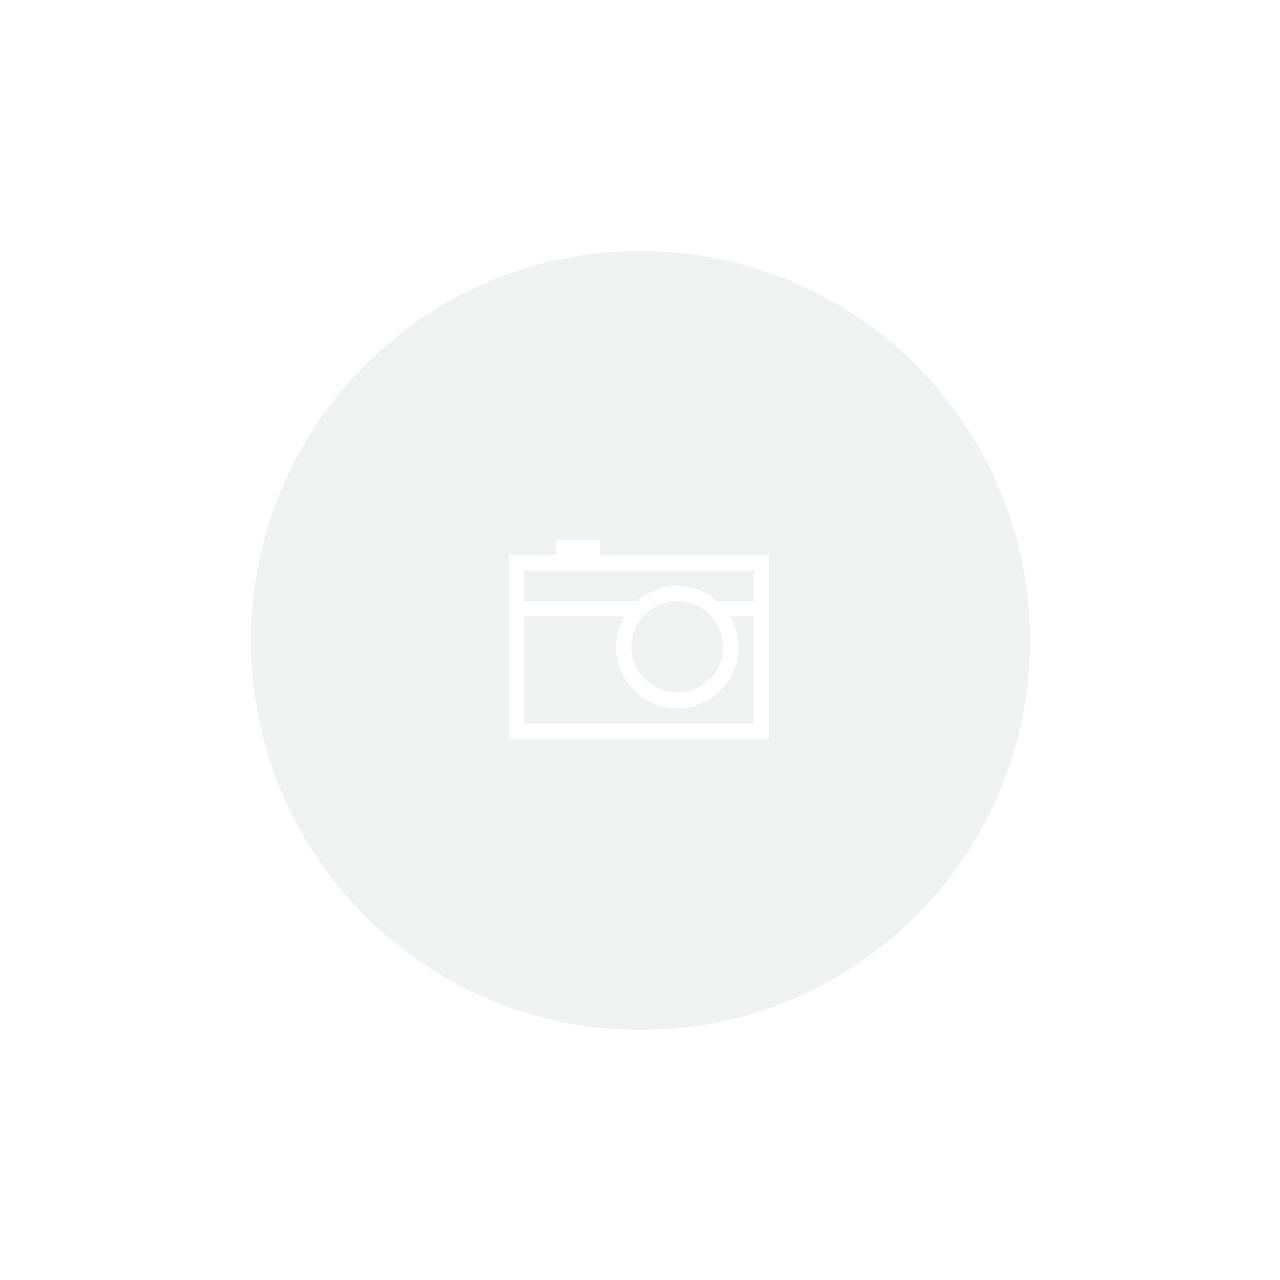 Lamicote Textura 180g - Ref. 10 Cobre